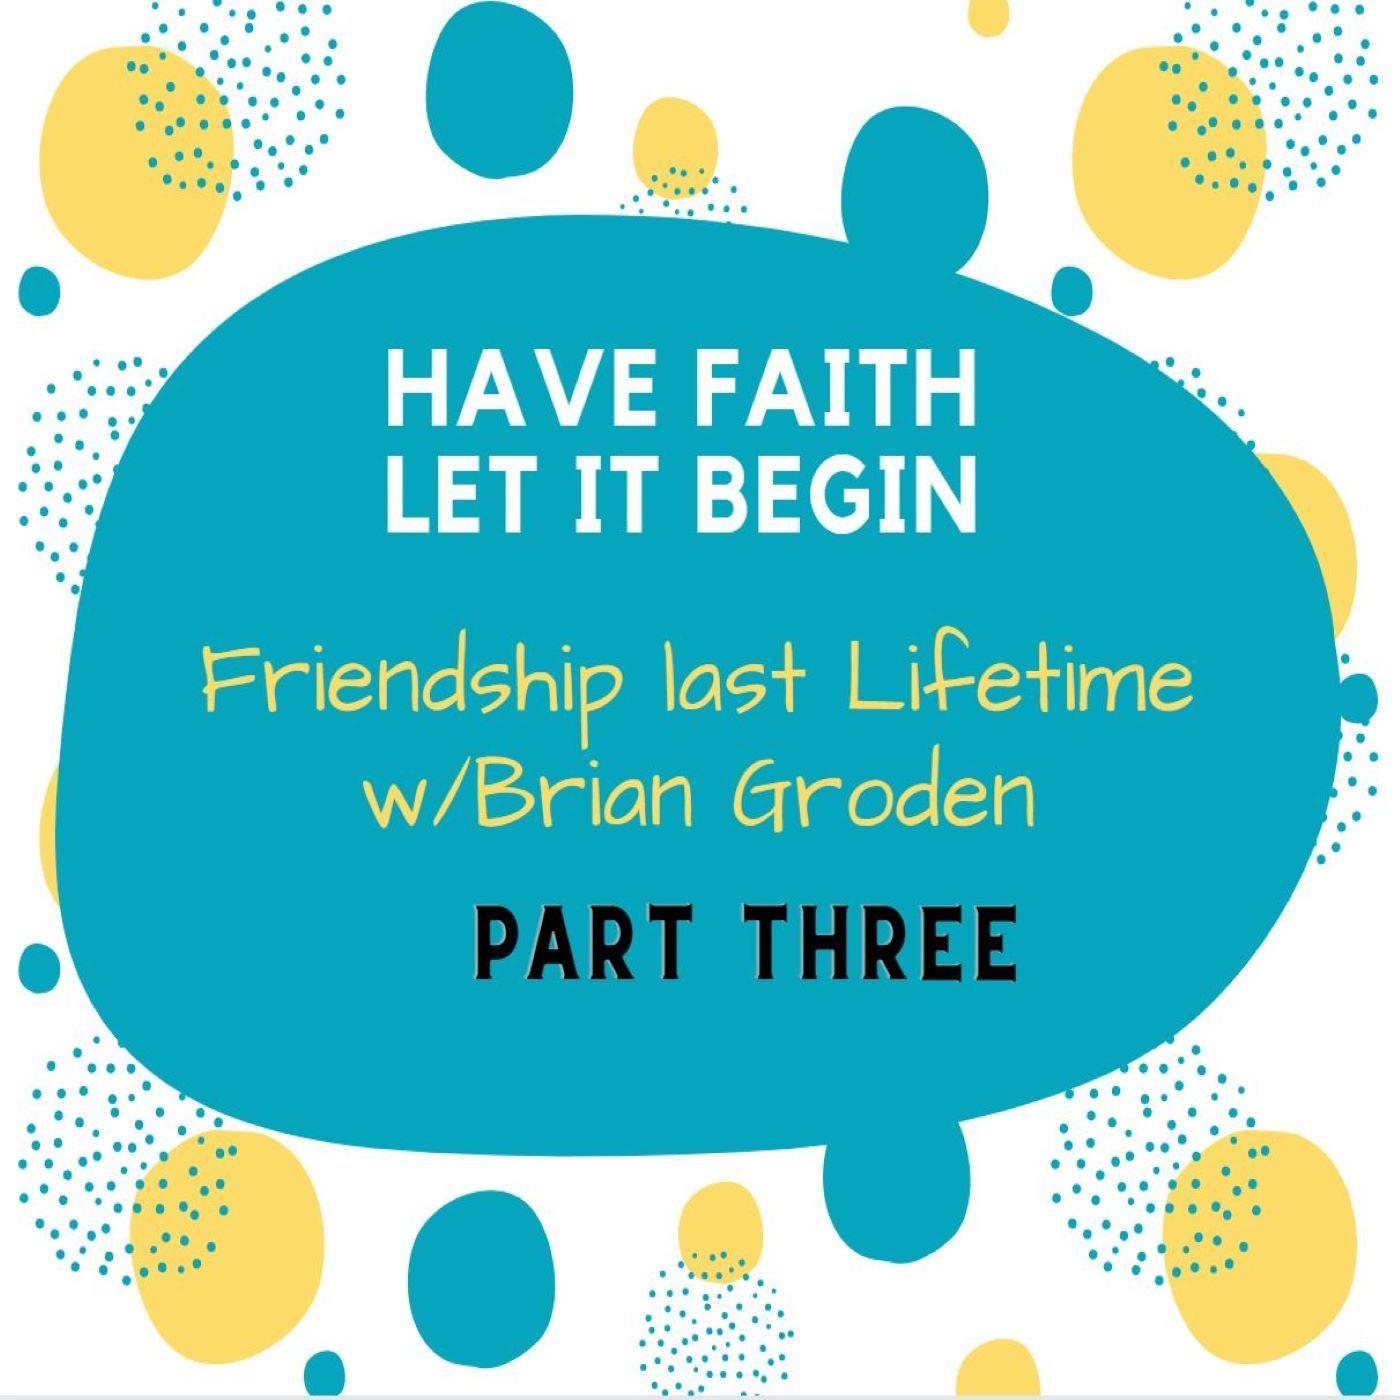 Friendship Last a Lifetime part 3 with Brian Groden